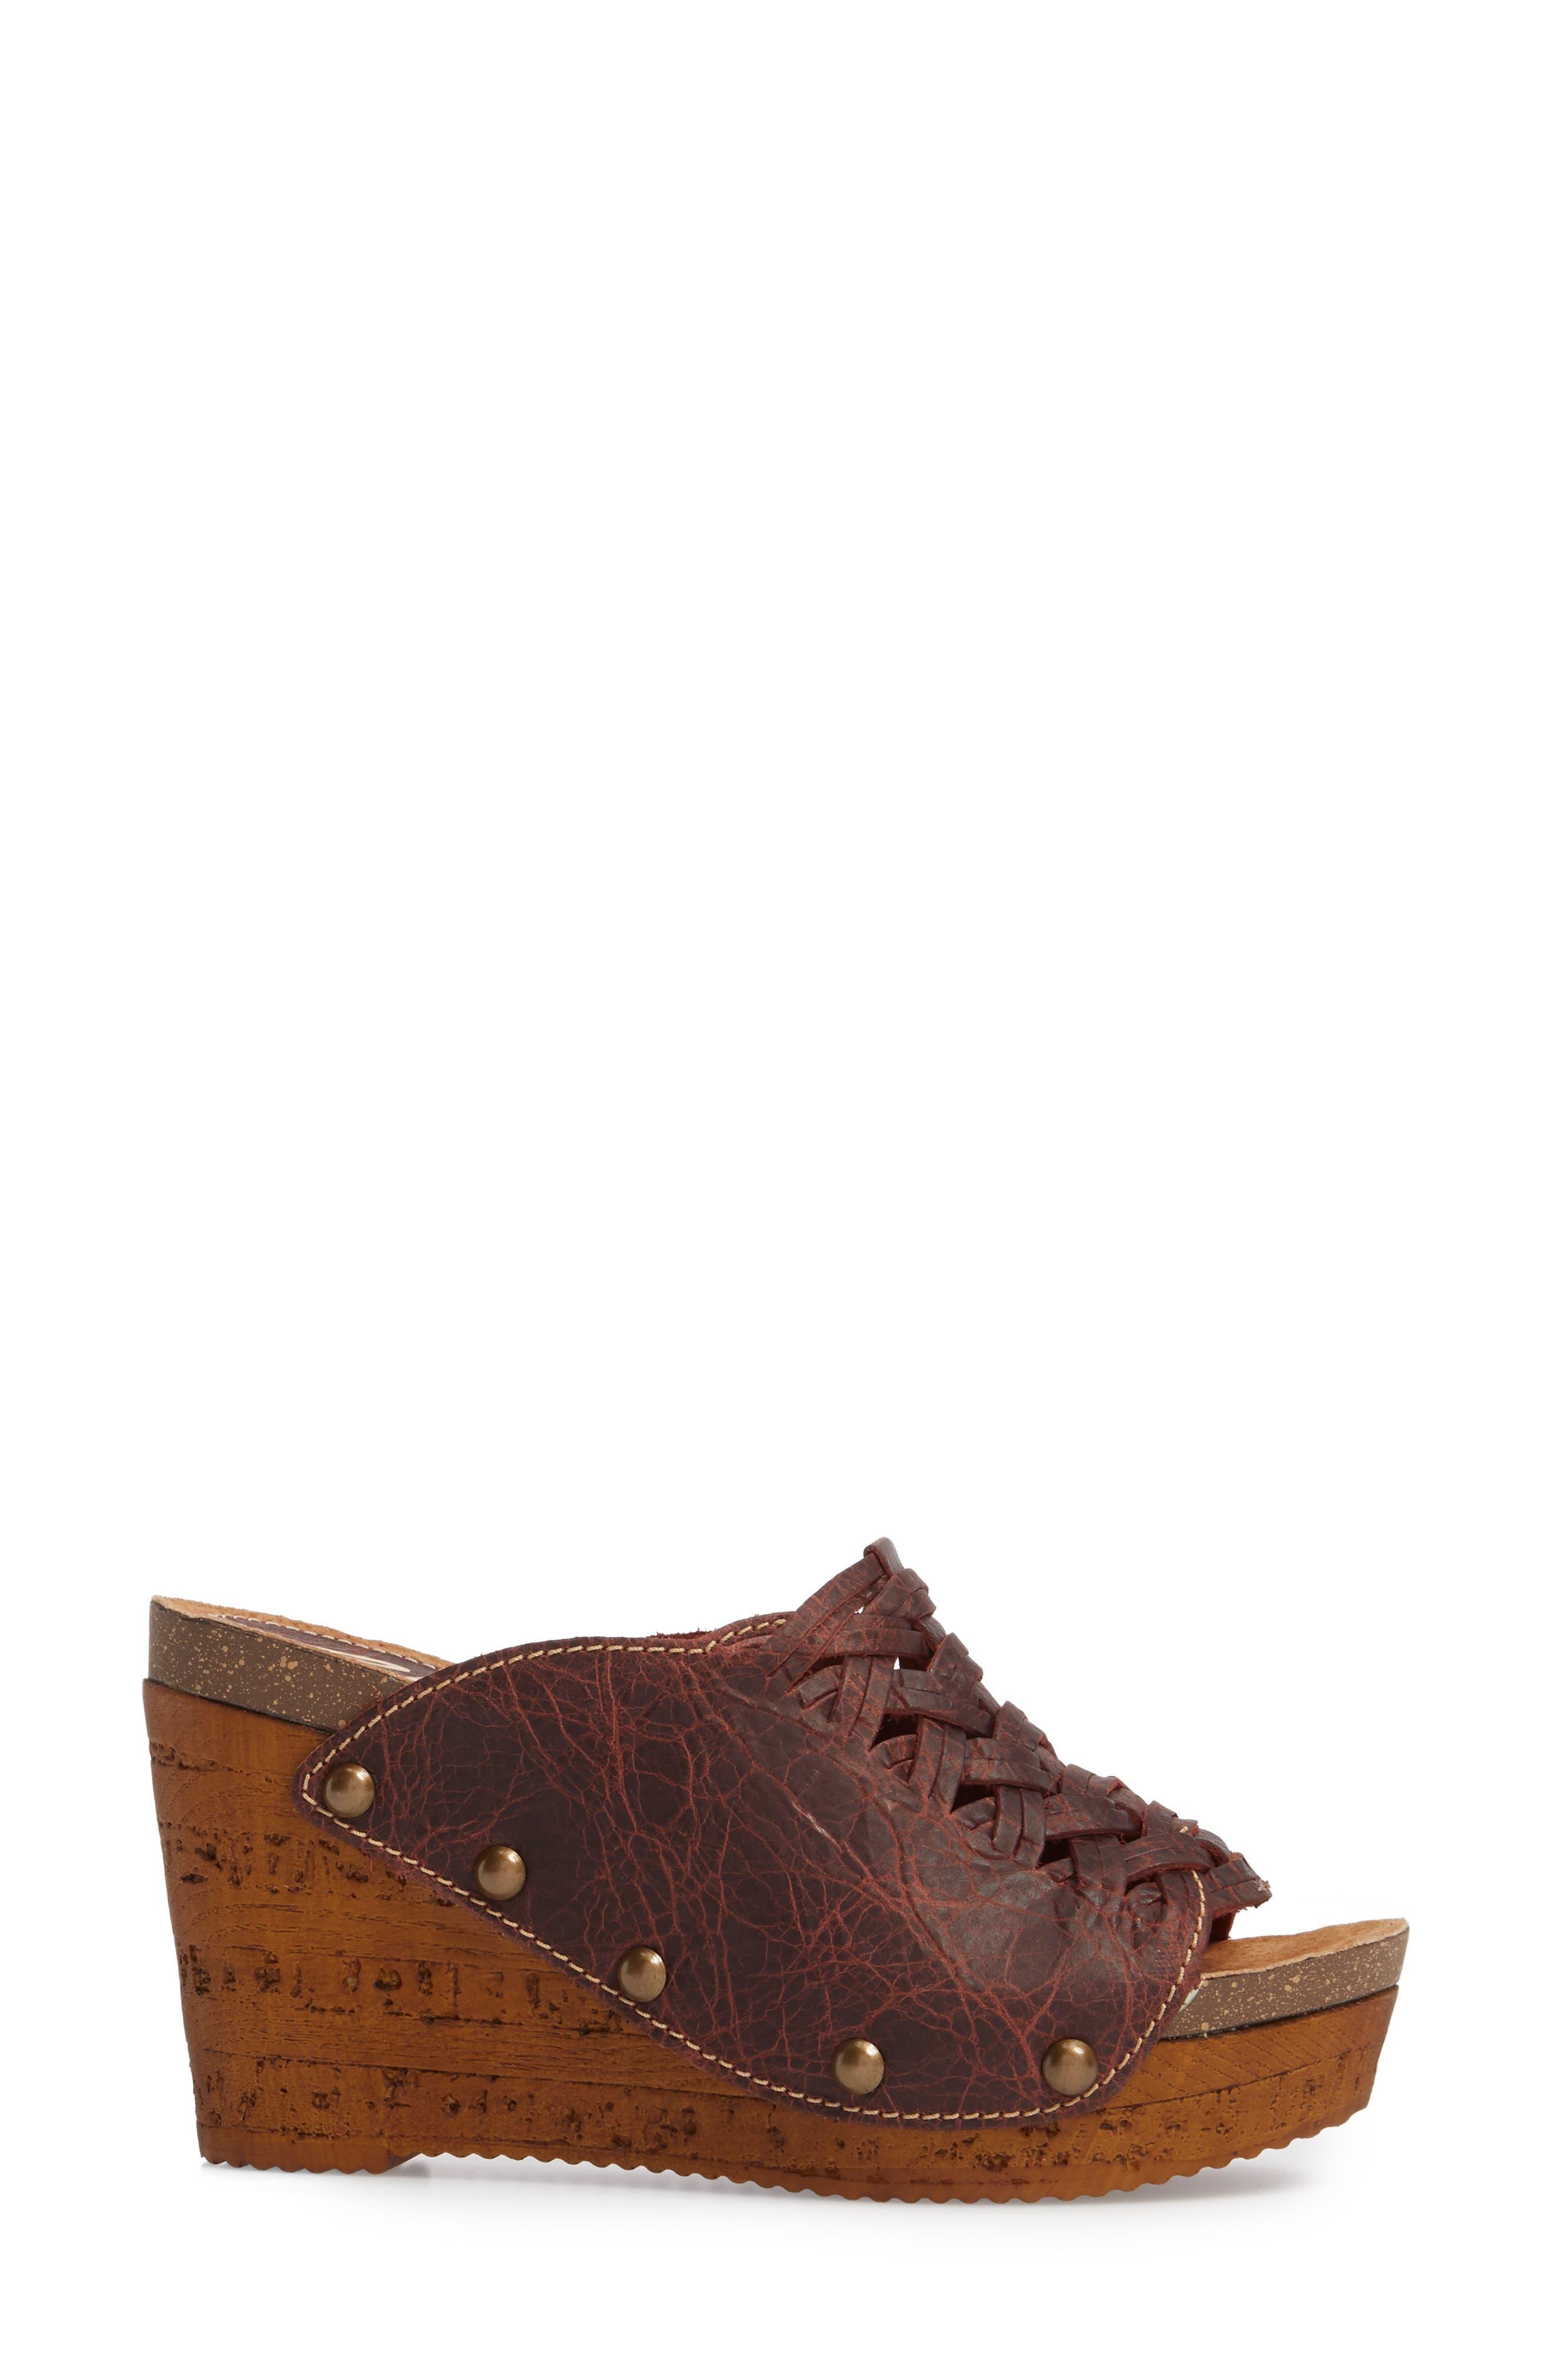 Genesis Platform Wedge Sandal,                             Alternate thumbnail 3, color,                             Wine